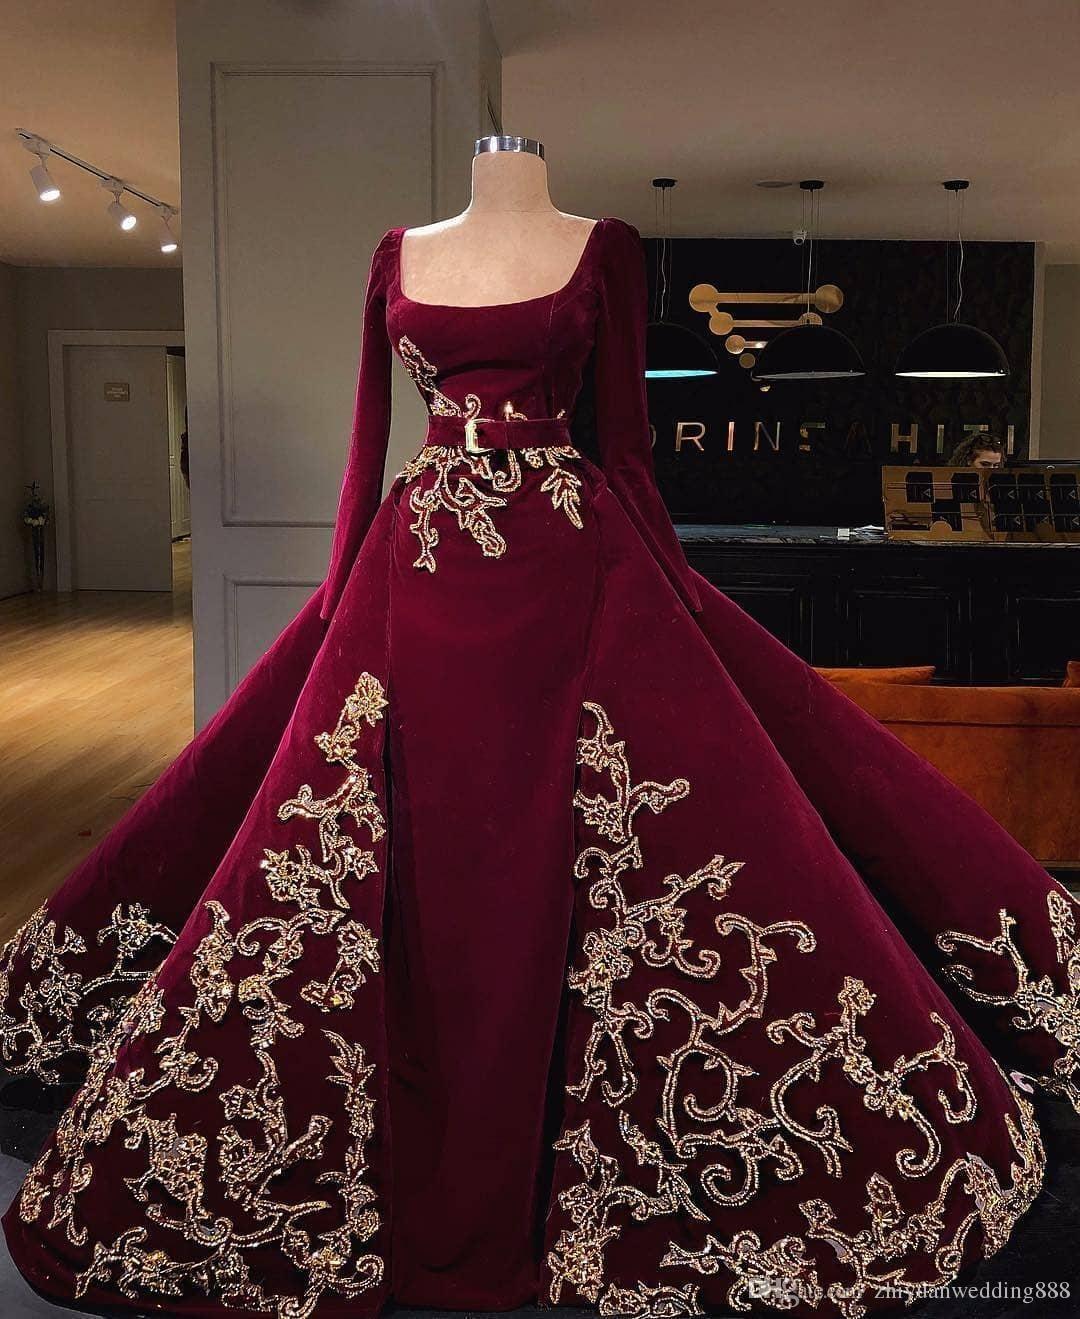 Burgundy Velvet Gold Crystals Embellishment Winter Ball Gown Wedding Dresses 2018 Long Sleeves Scoop Neckline Gowns Green